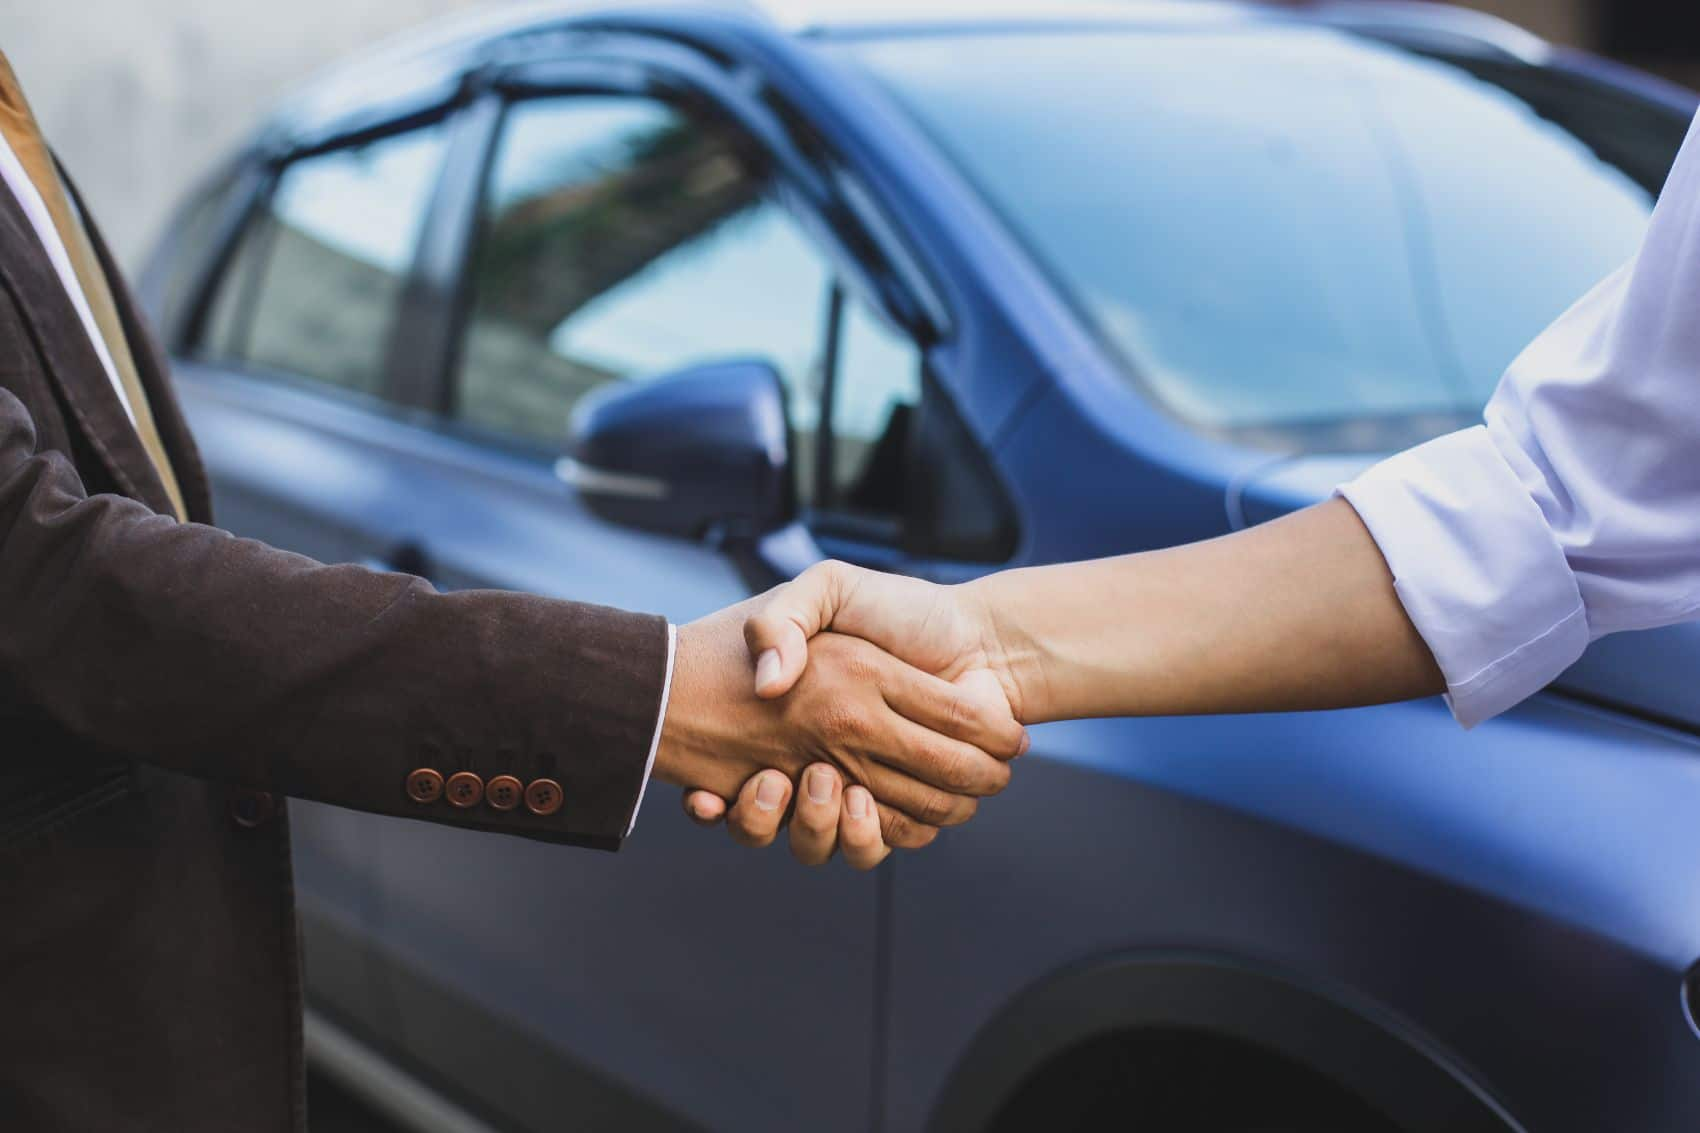 CarMax Survey Shows What Tech Features Buyers Deem Most Important